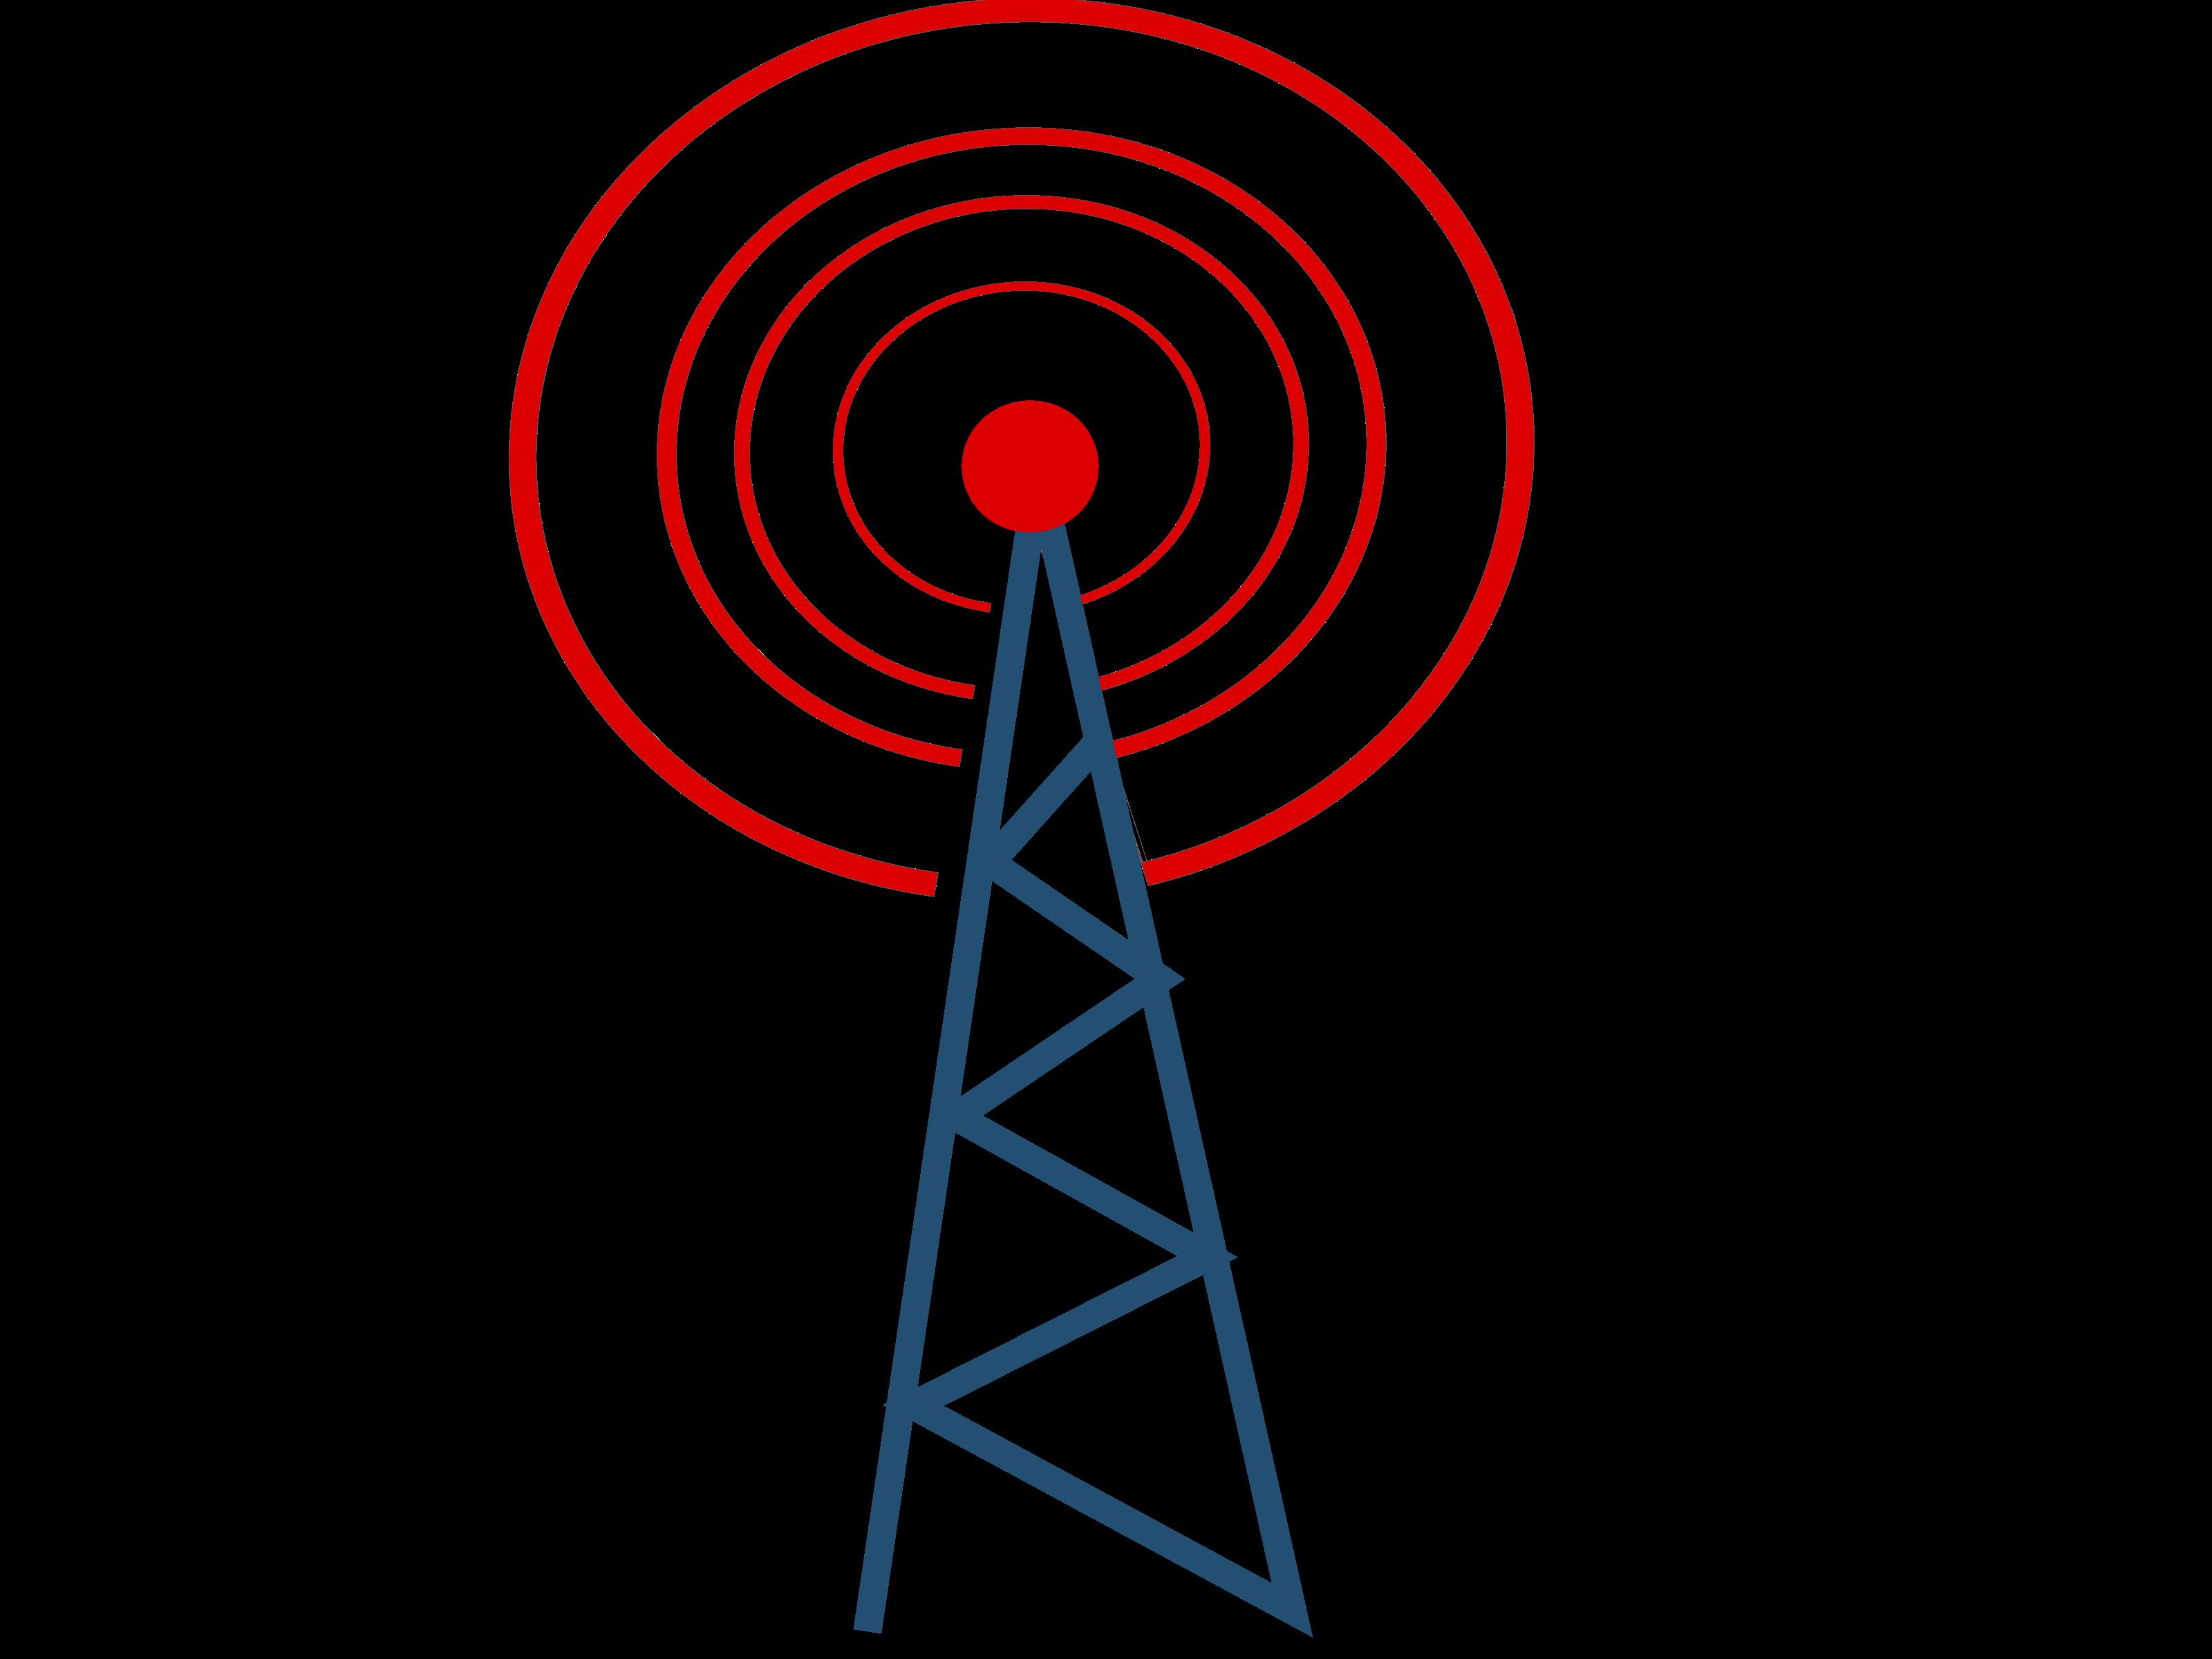 Network clipart network telecom, Network network telecom.